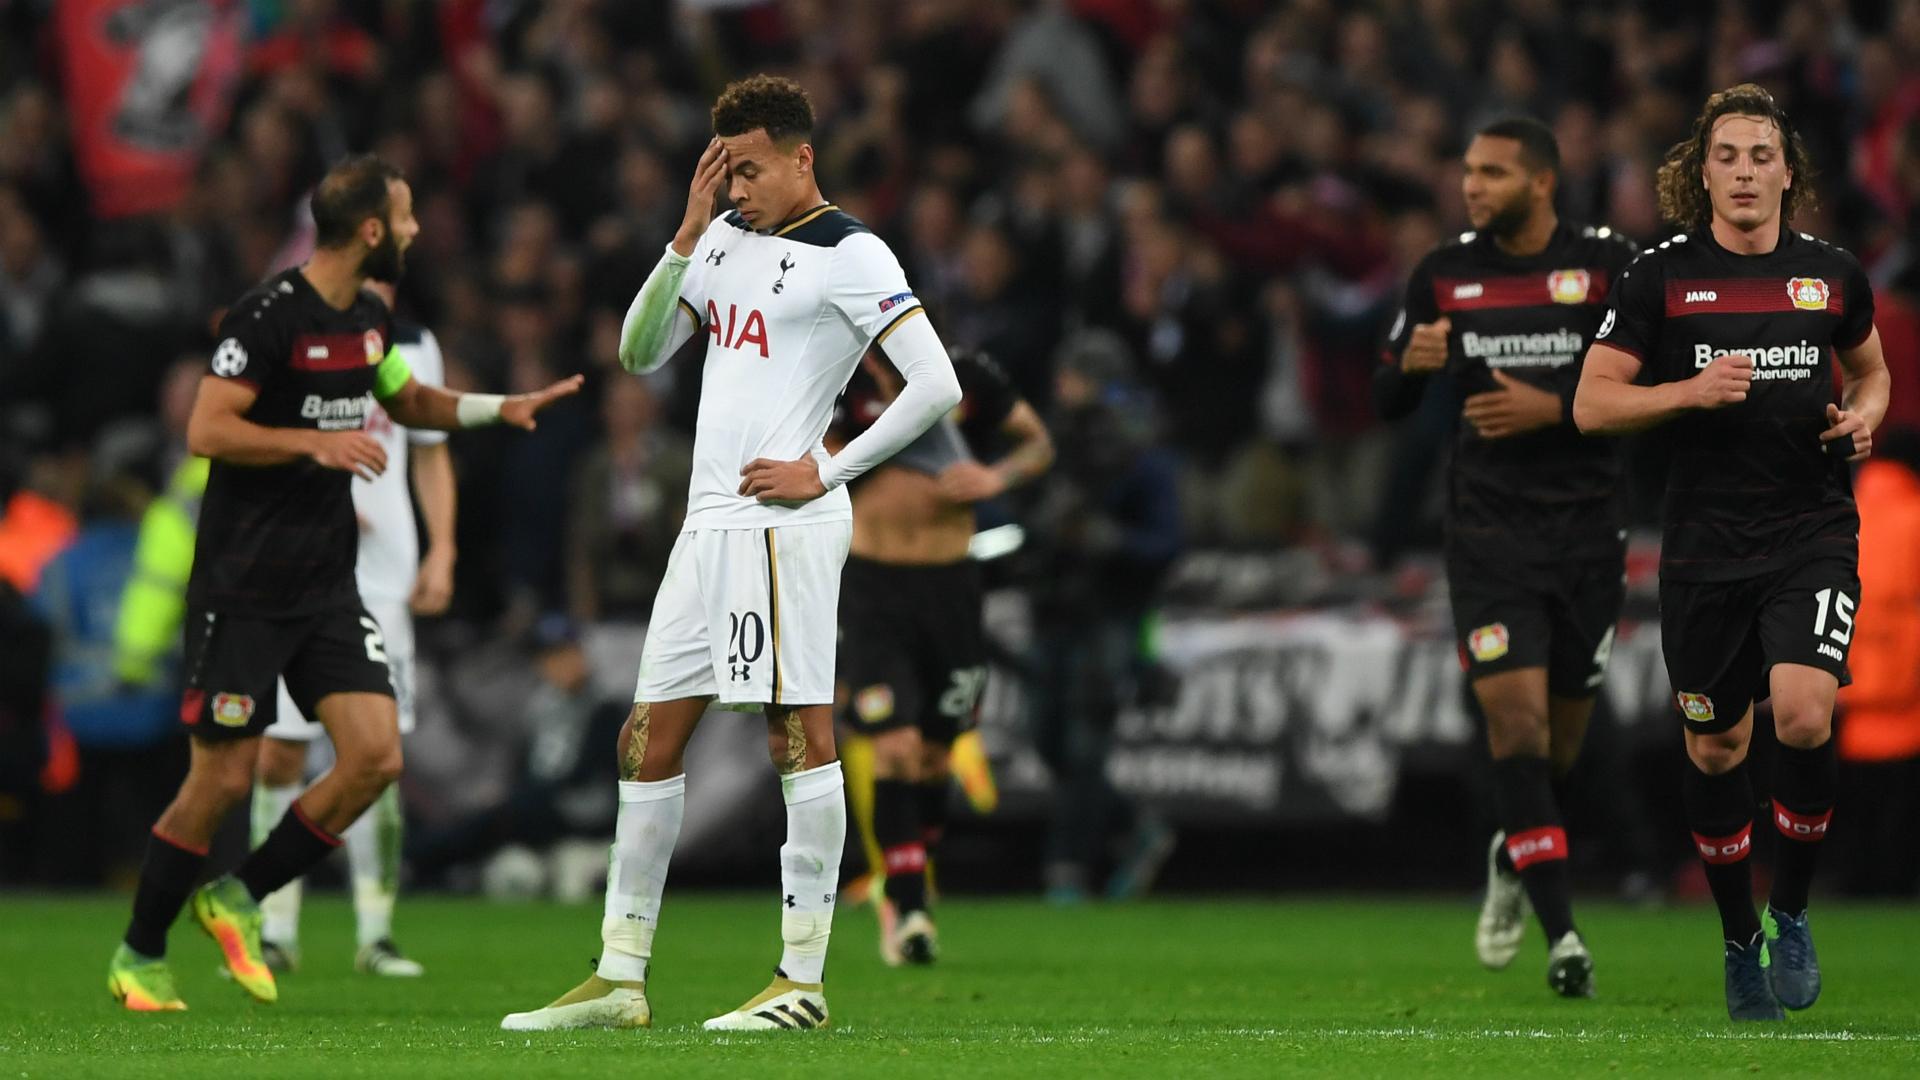 Tottenham Hotspur Bayer Leverkusen Wembley UCL 021116